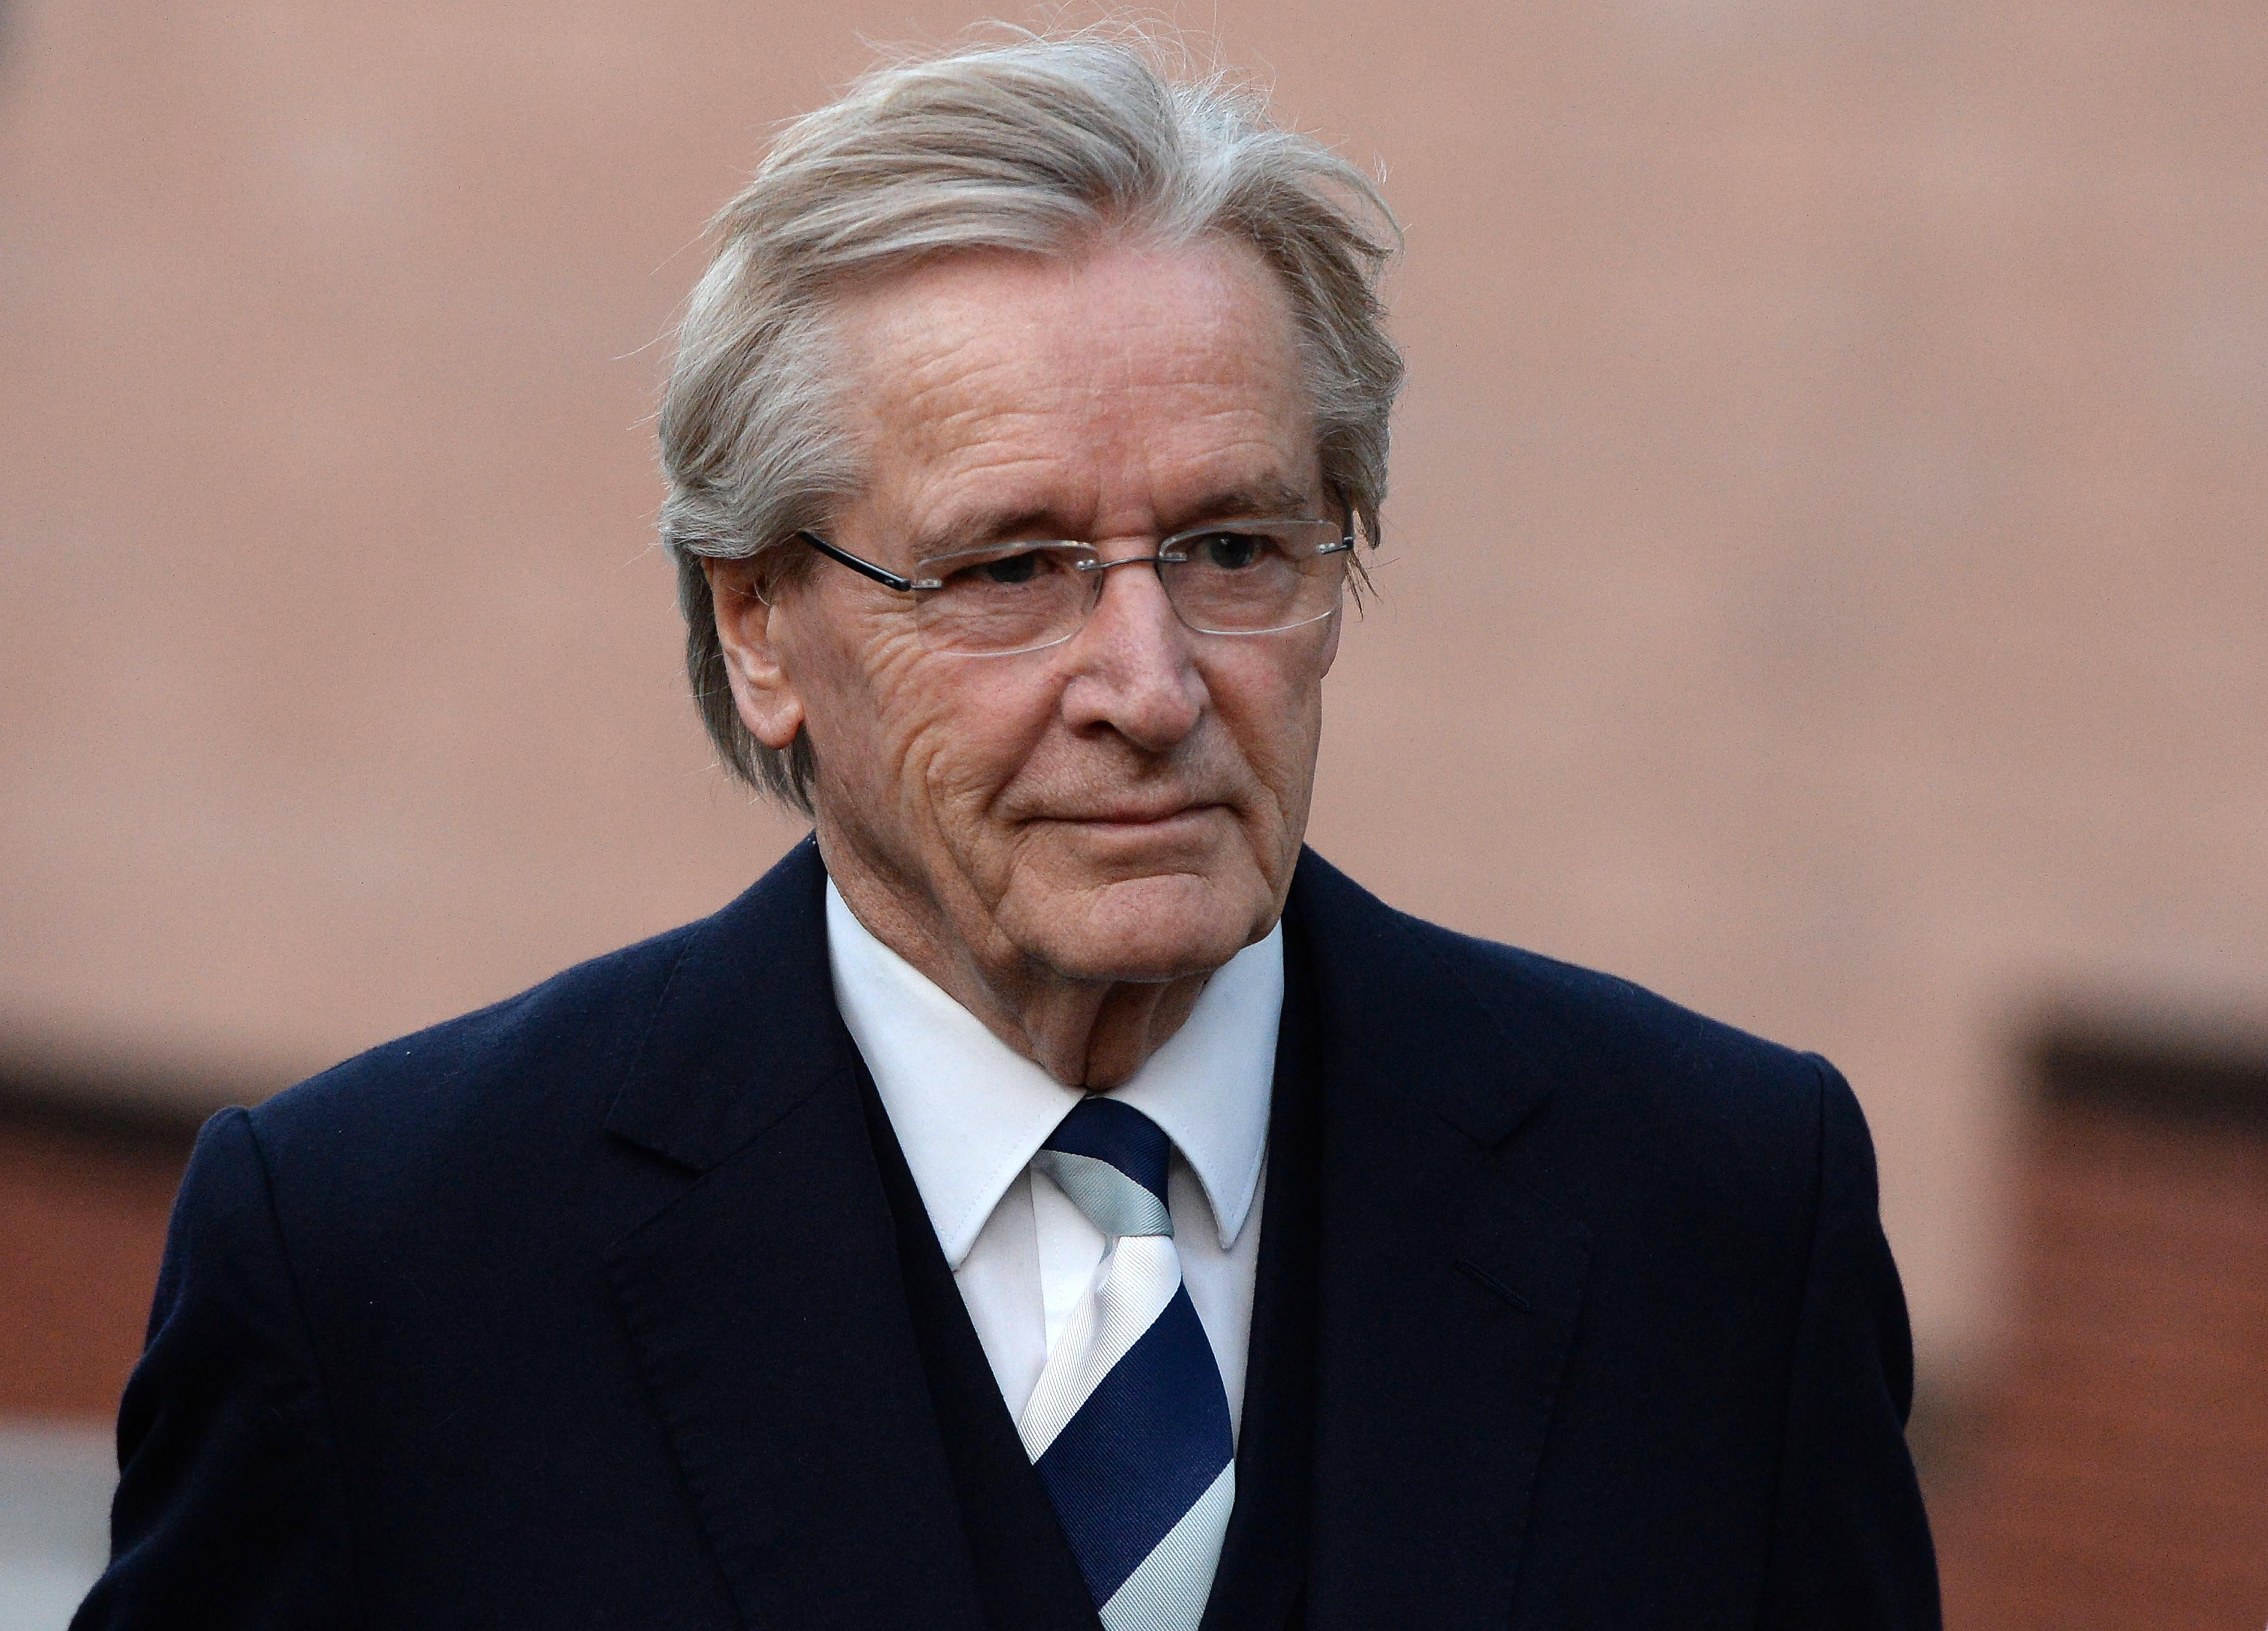 Coronation Street star Bill Roache 'got over his daughter's death in days'